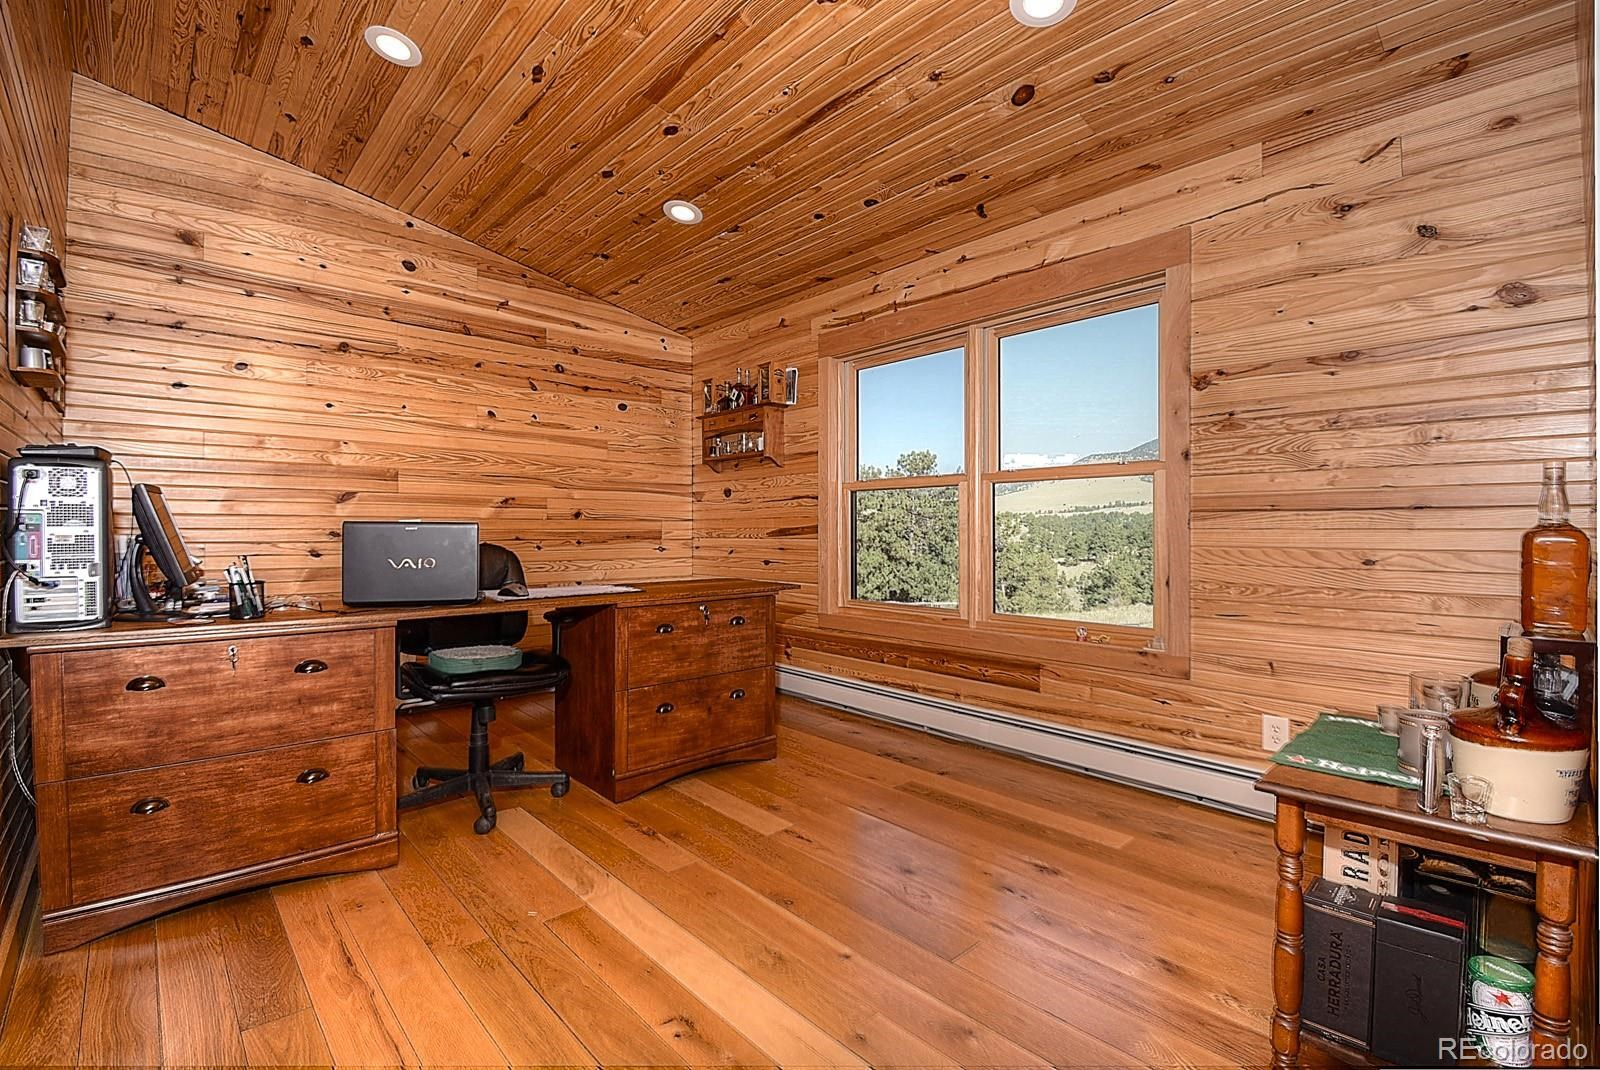 MLS# 8182693 - 23 - 396 Eagle Nest Trail, Guffey, CO 80820